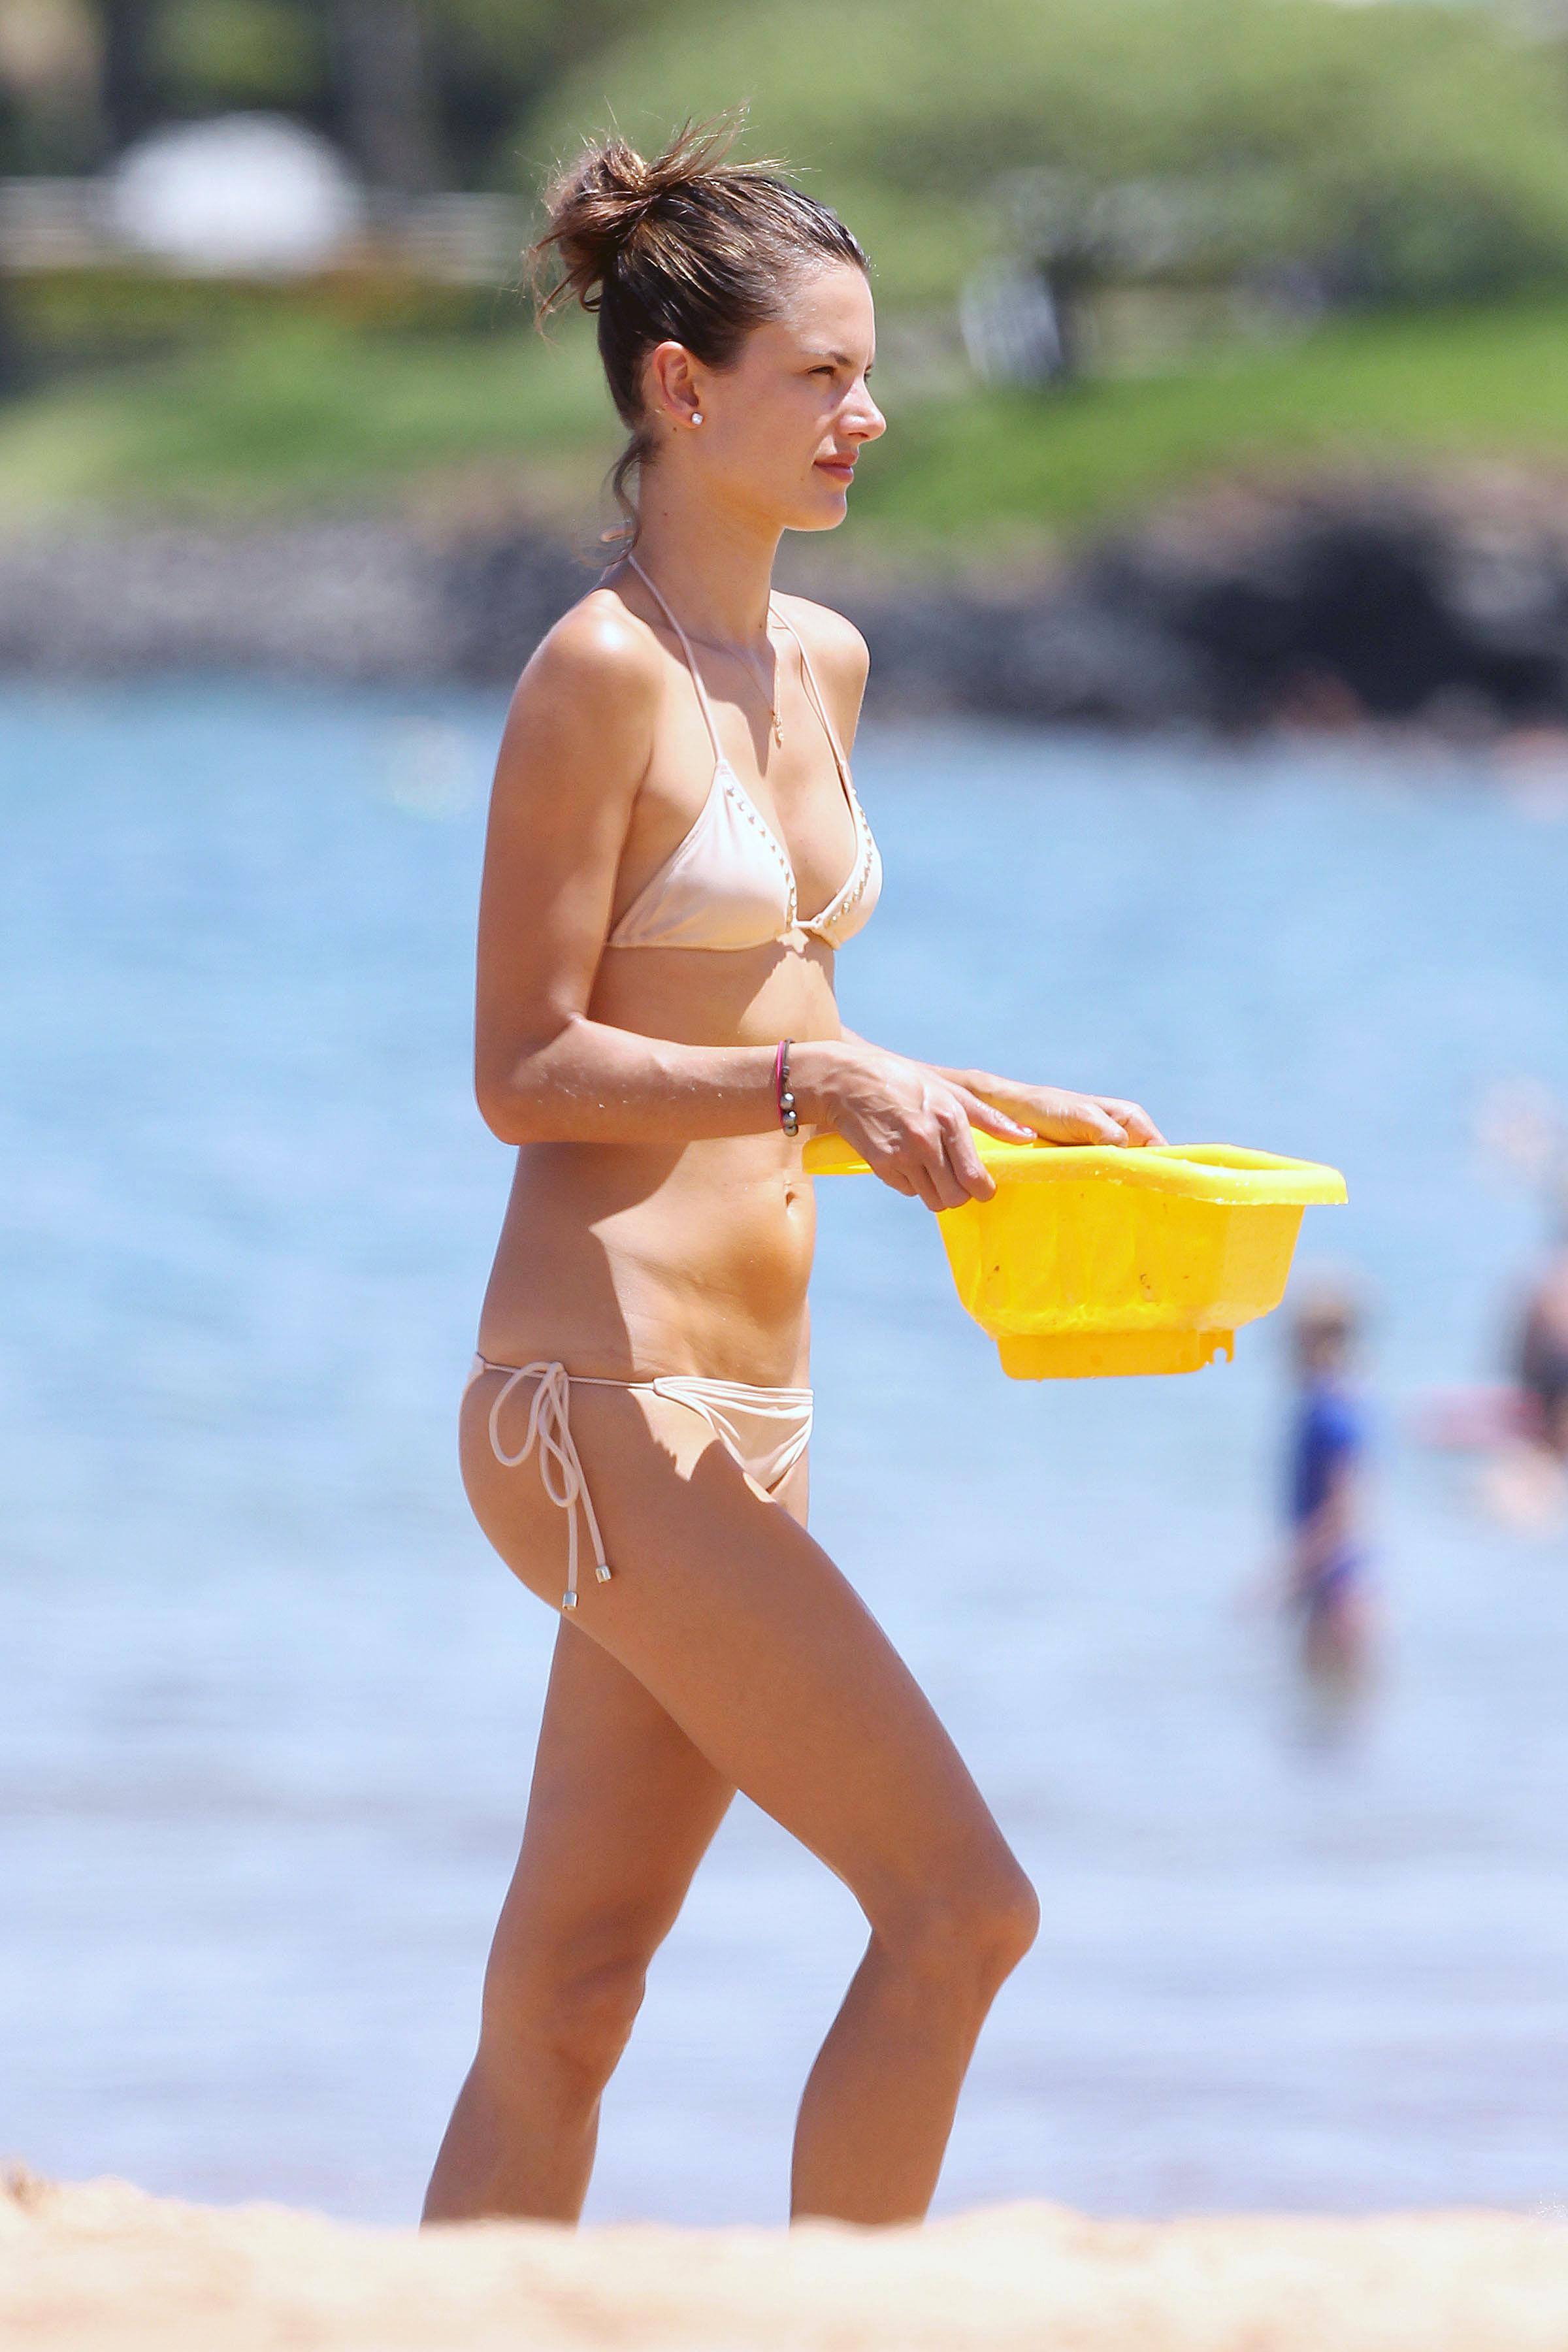 79581_Alessandra_Ambrosio_on_the_beach_in_Hawaii_122_364lo.jpg